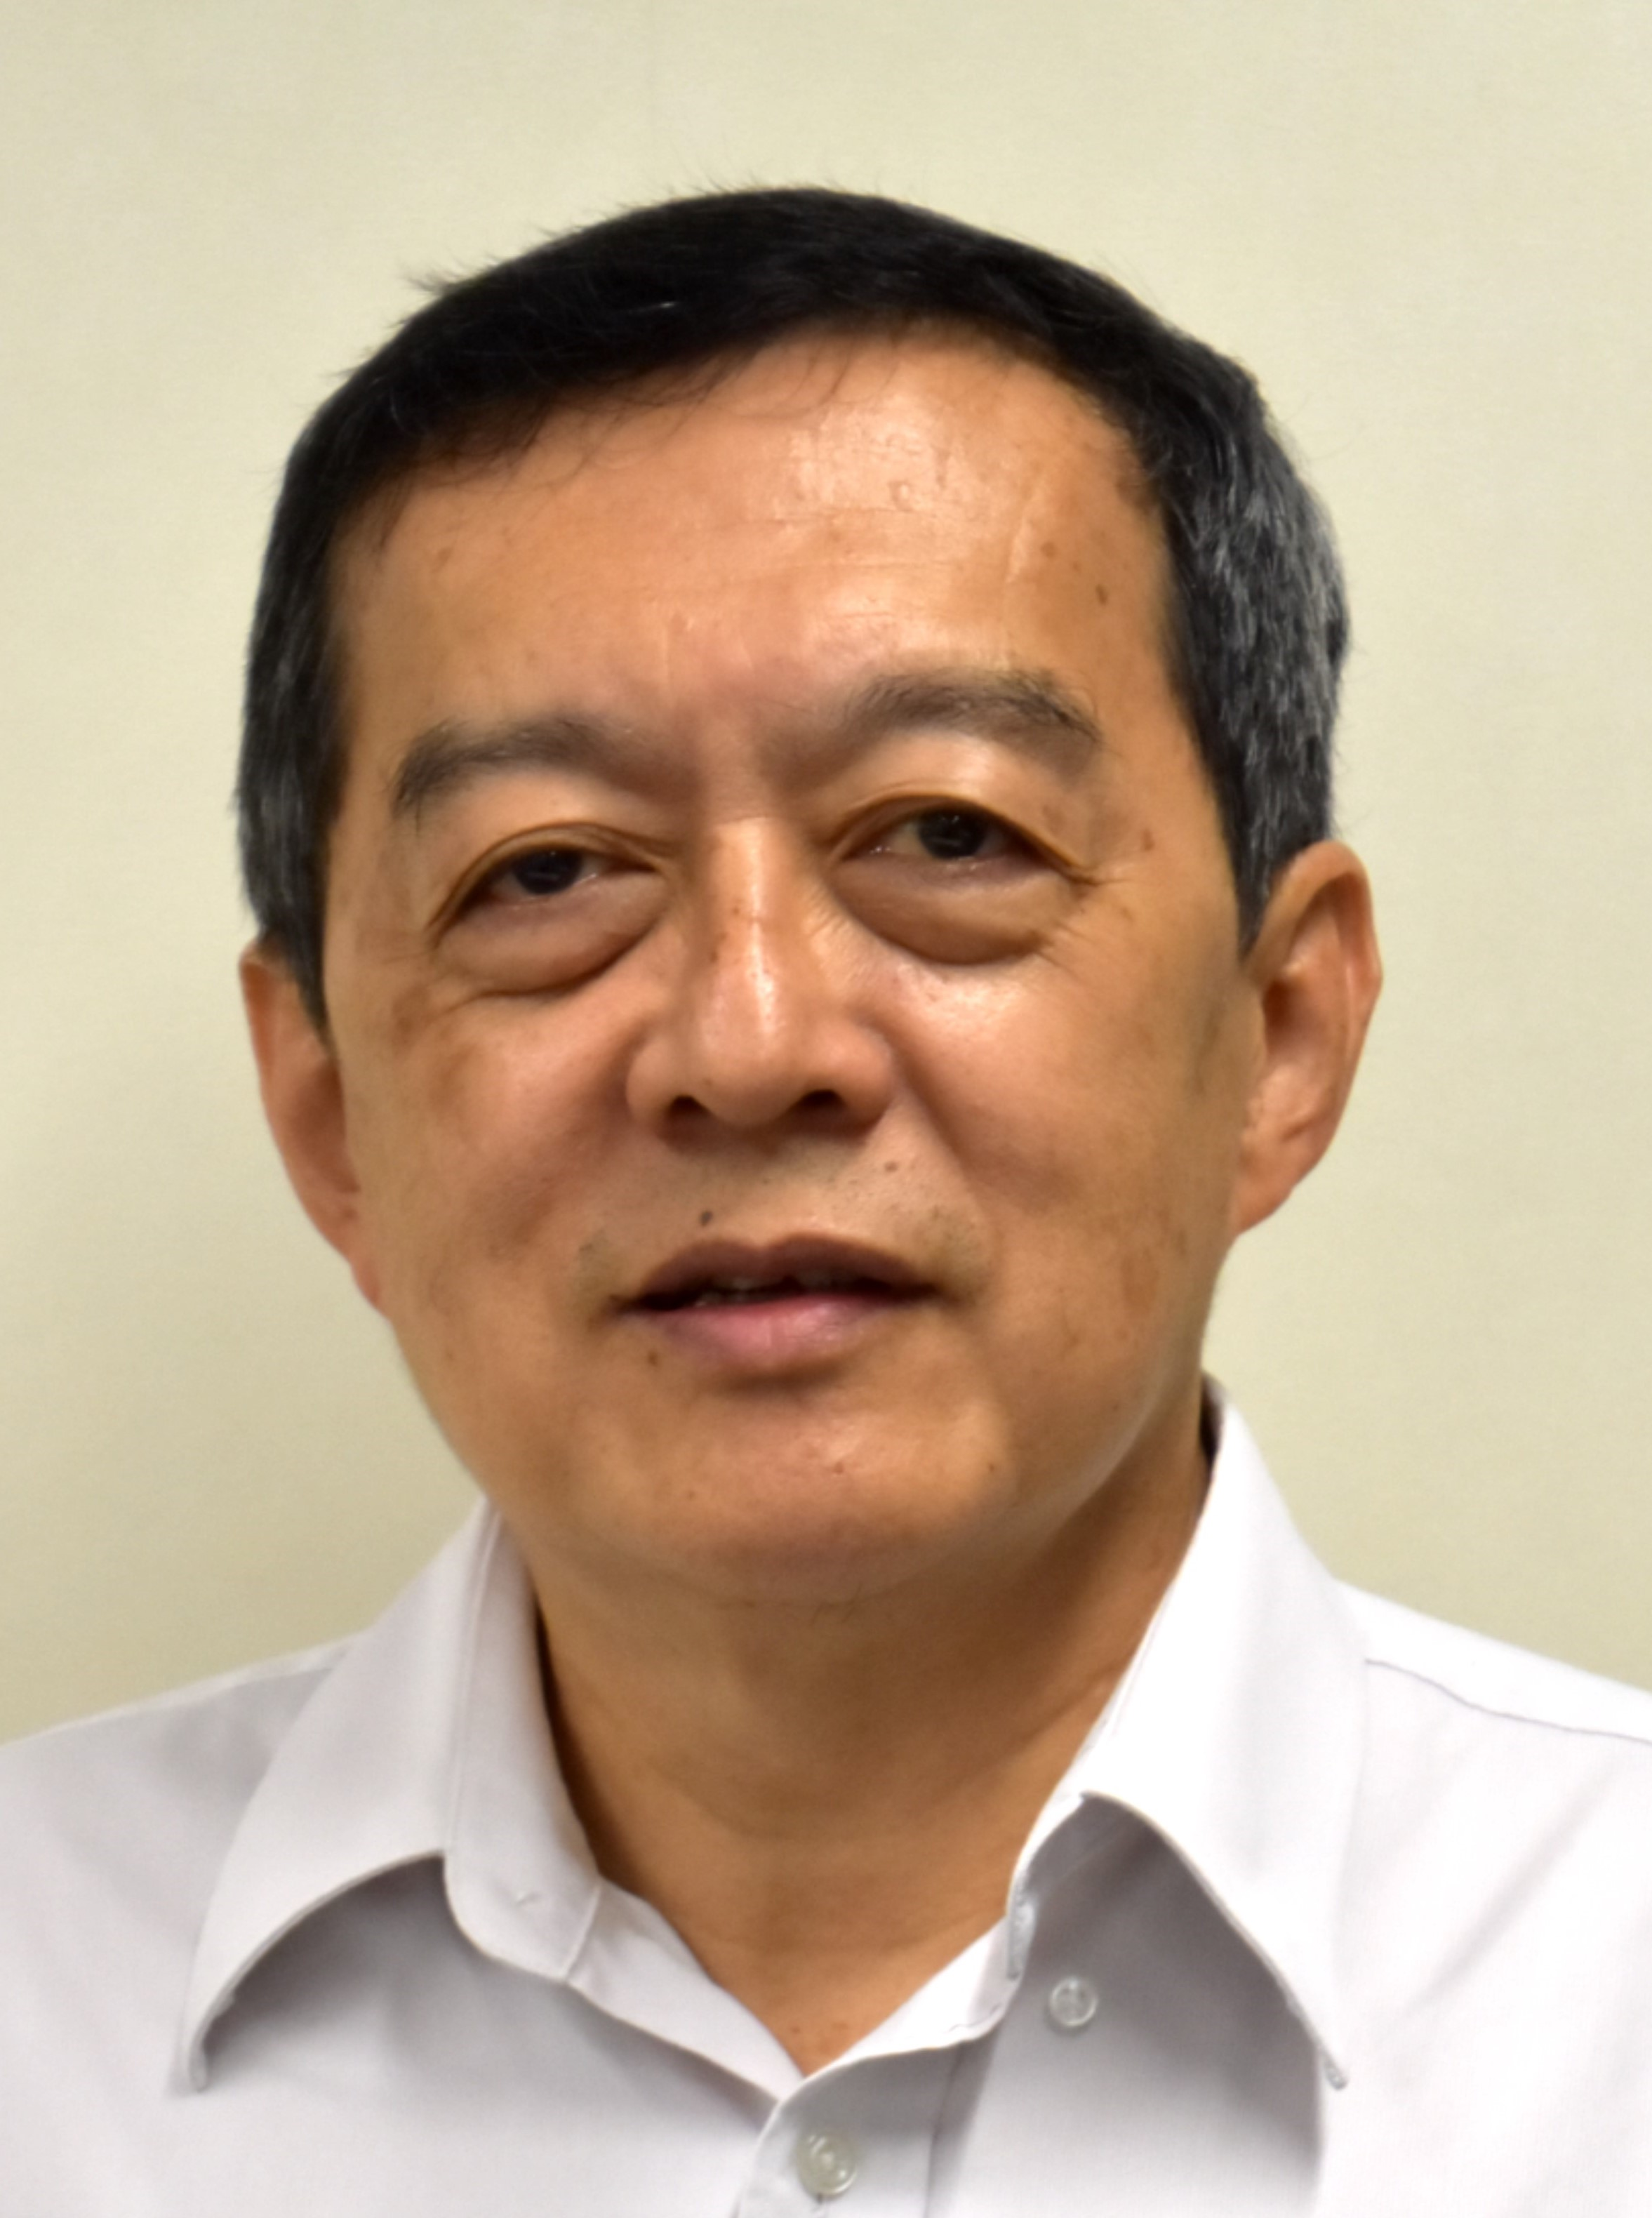 Mr Chong Hou Chun